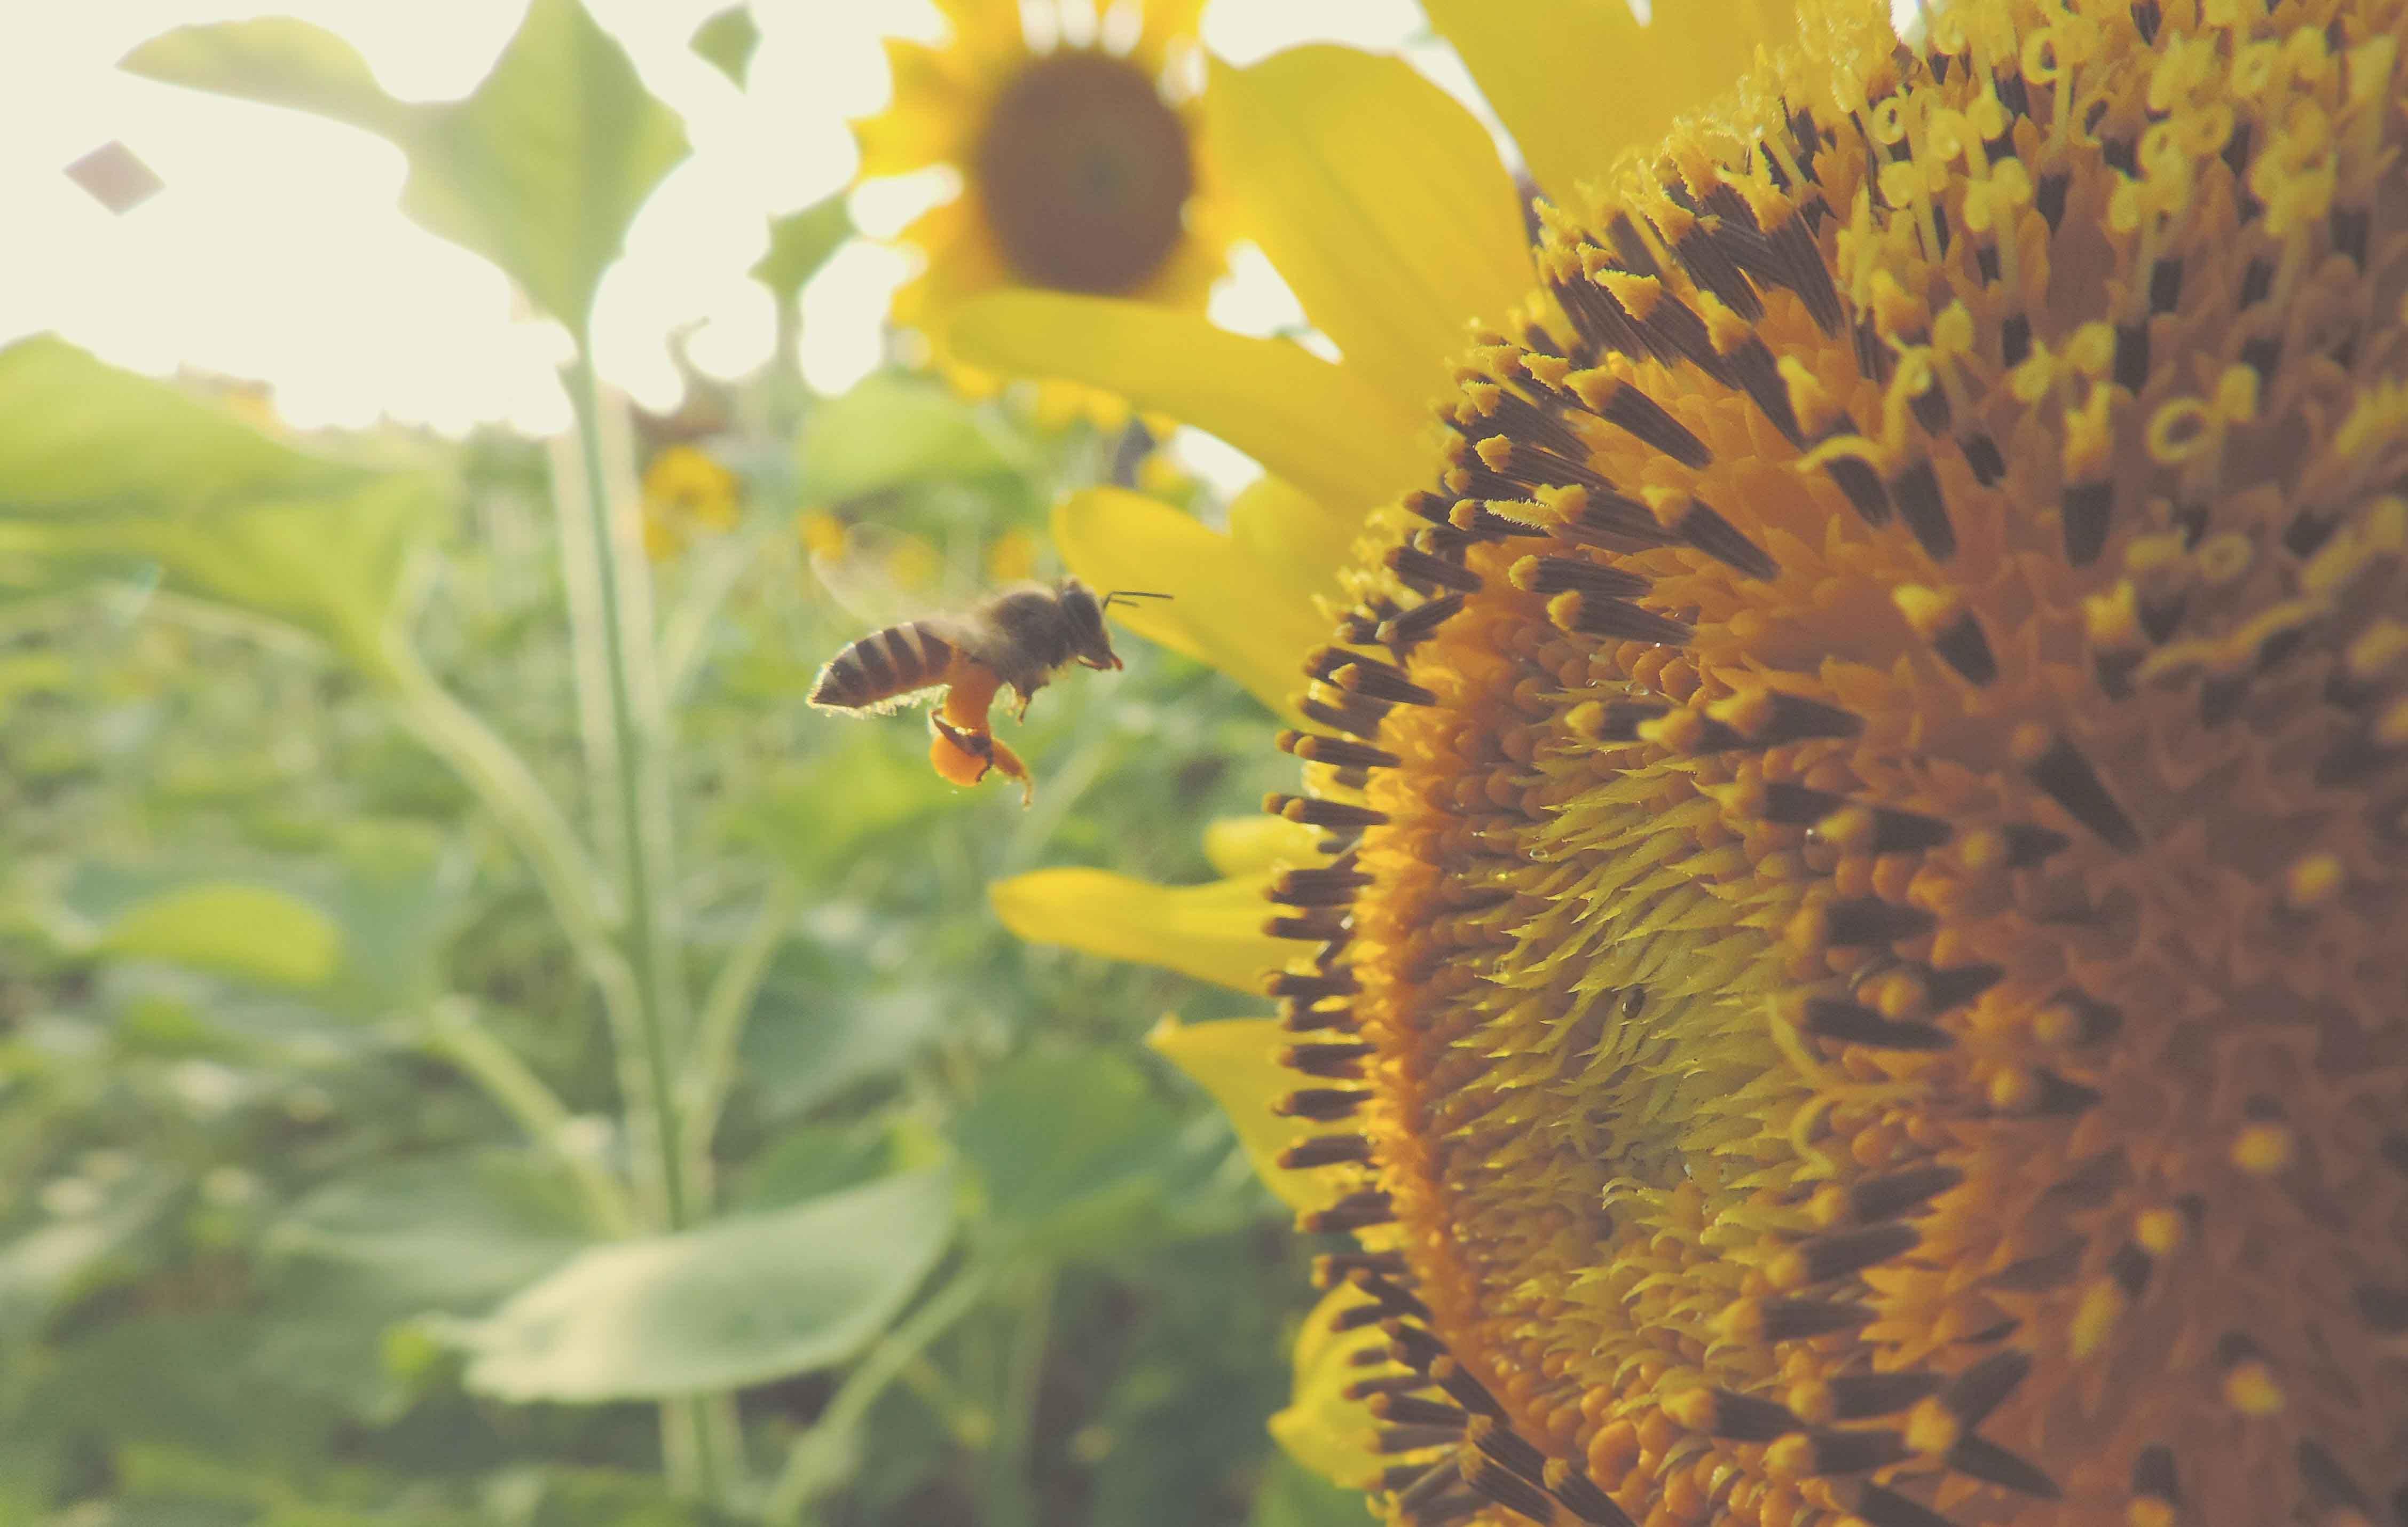 abeja aproximándose a un girasol